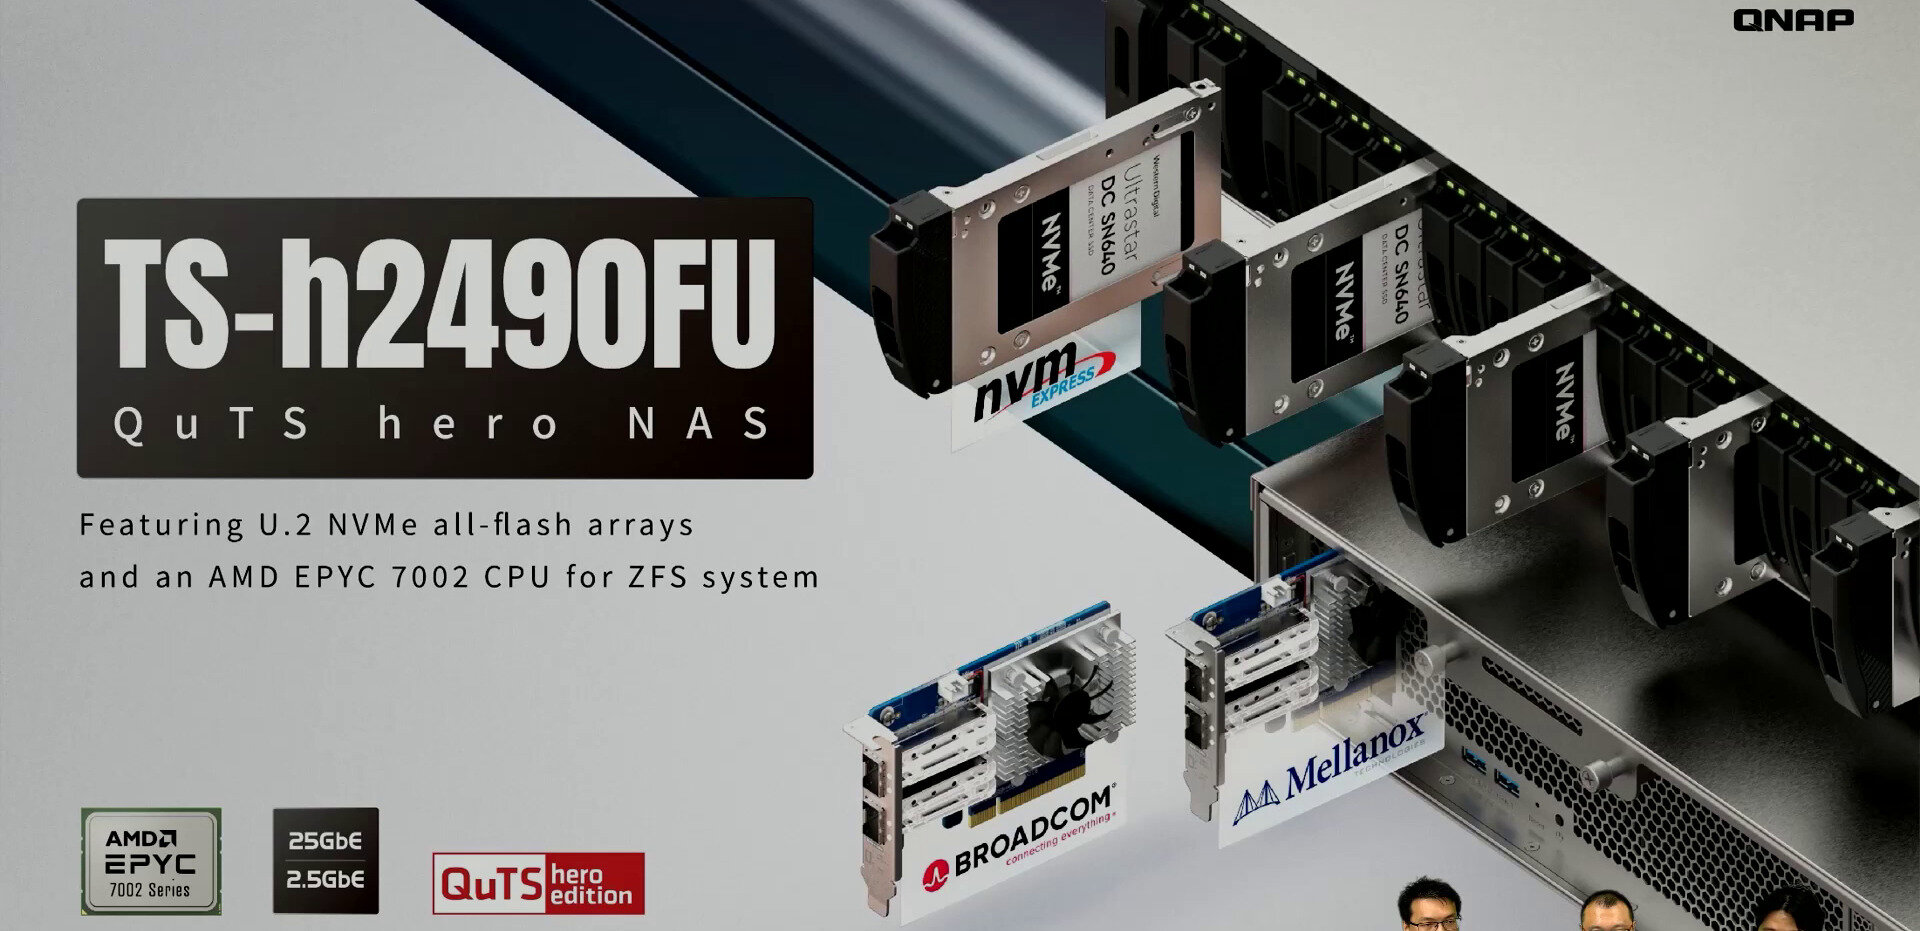 NAS rackables TS-h2490FU : QNAP passe aux AMD EPYC 7002 avec 4x SmartNIC 25 GbE